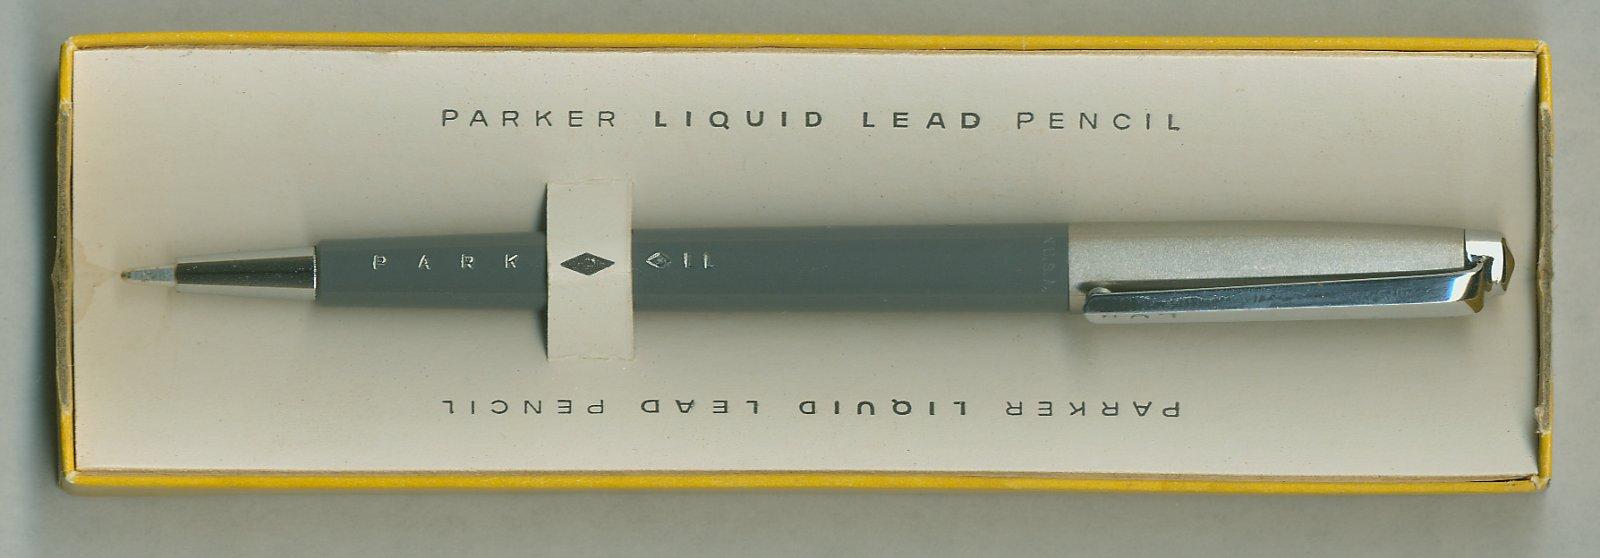 Liquid Lead Pencil Penlibrarycom Parker Liquid Lead Pencil